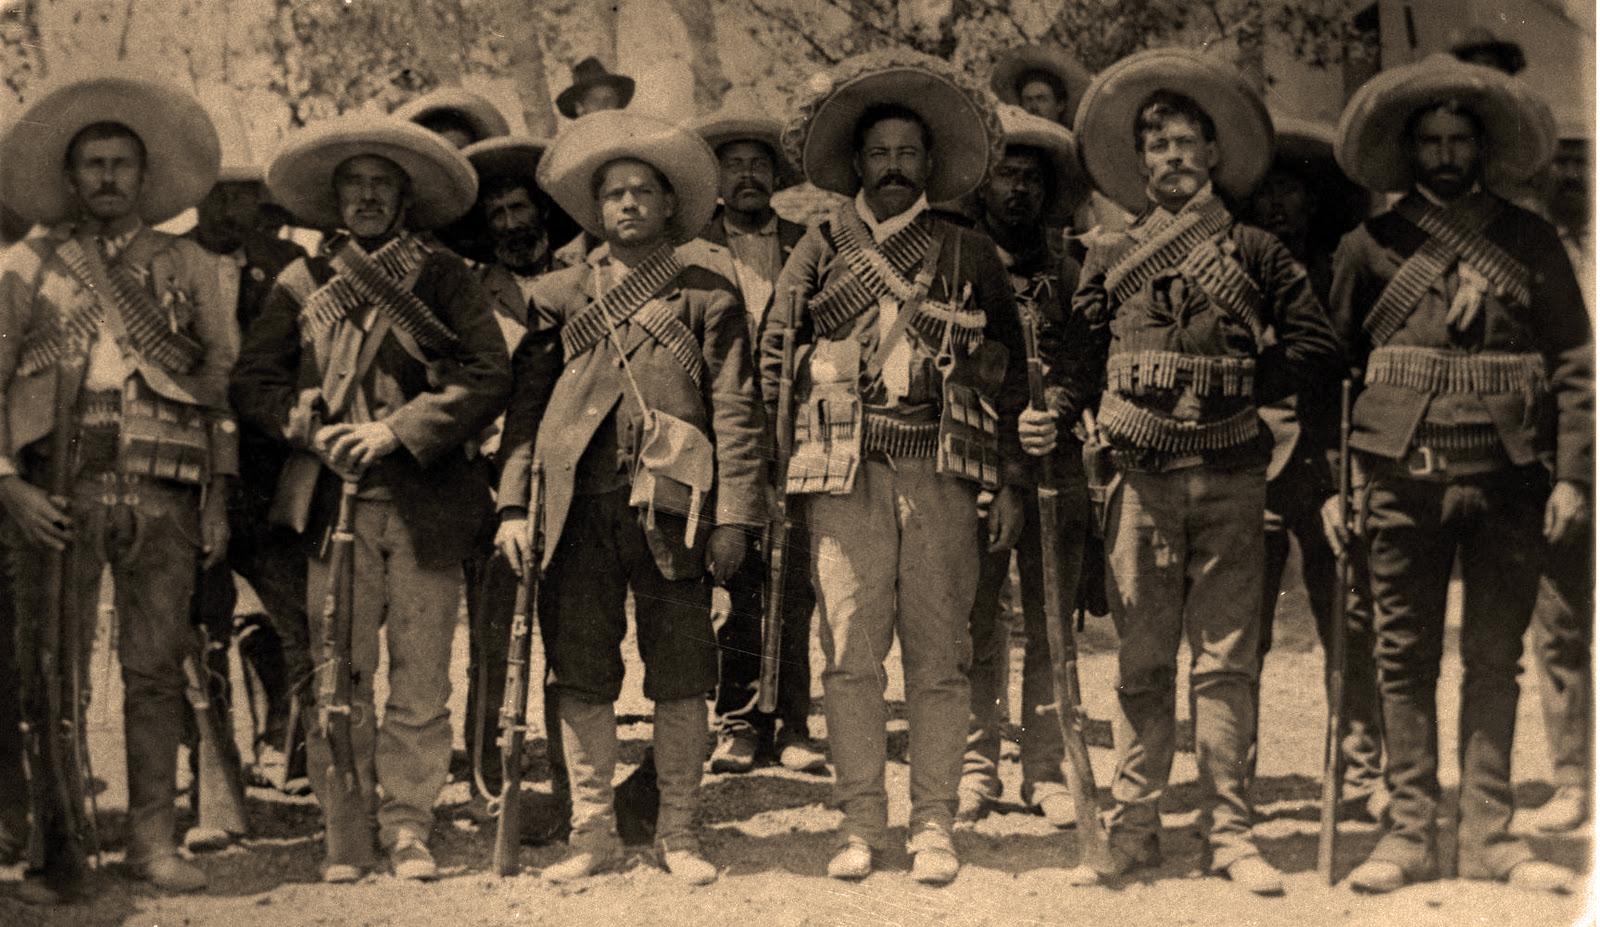 Fotos de la revolucion mexicana de 1910 17